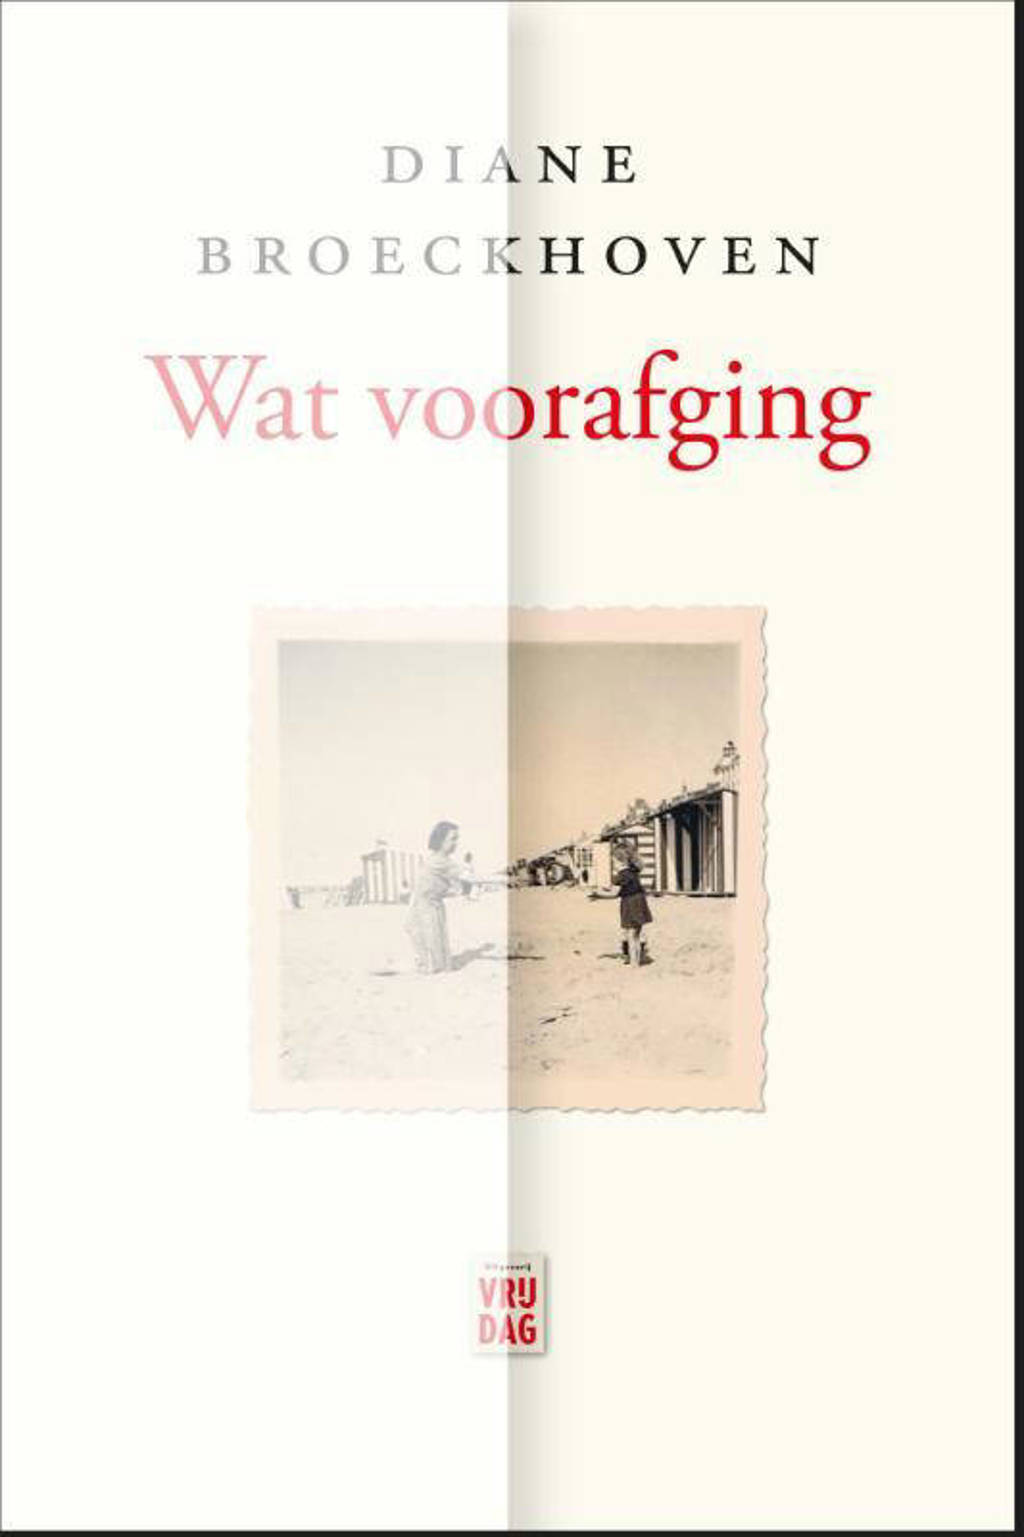 Wat voorafging - Diane Broeckhoven